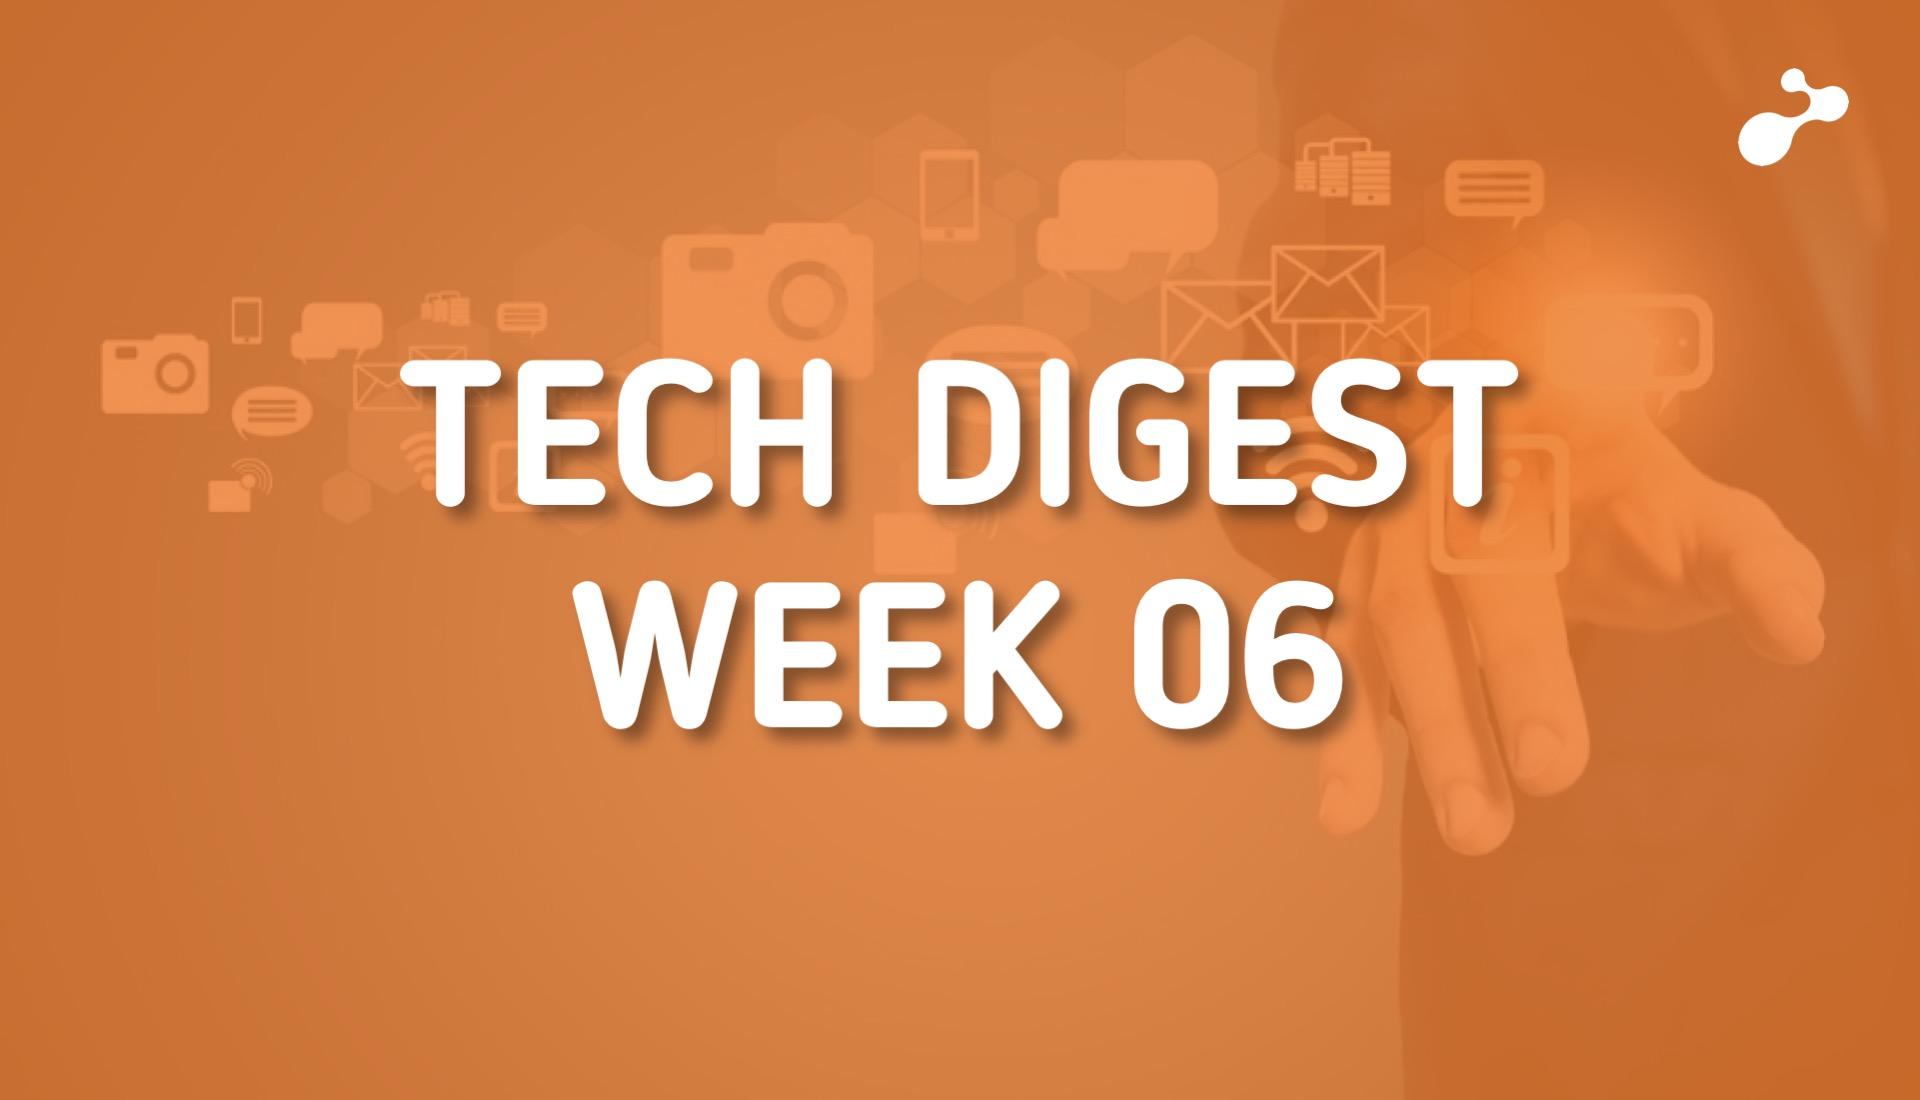 Technology news around the world - Week 06, 2019